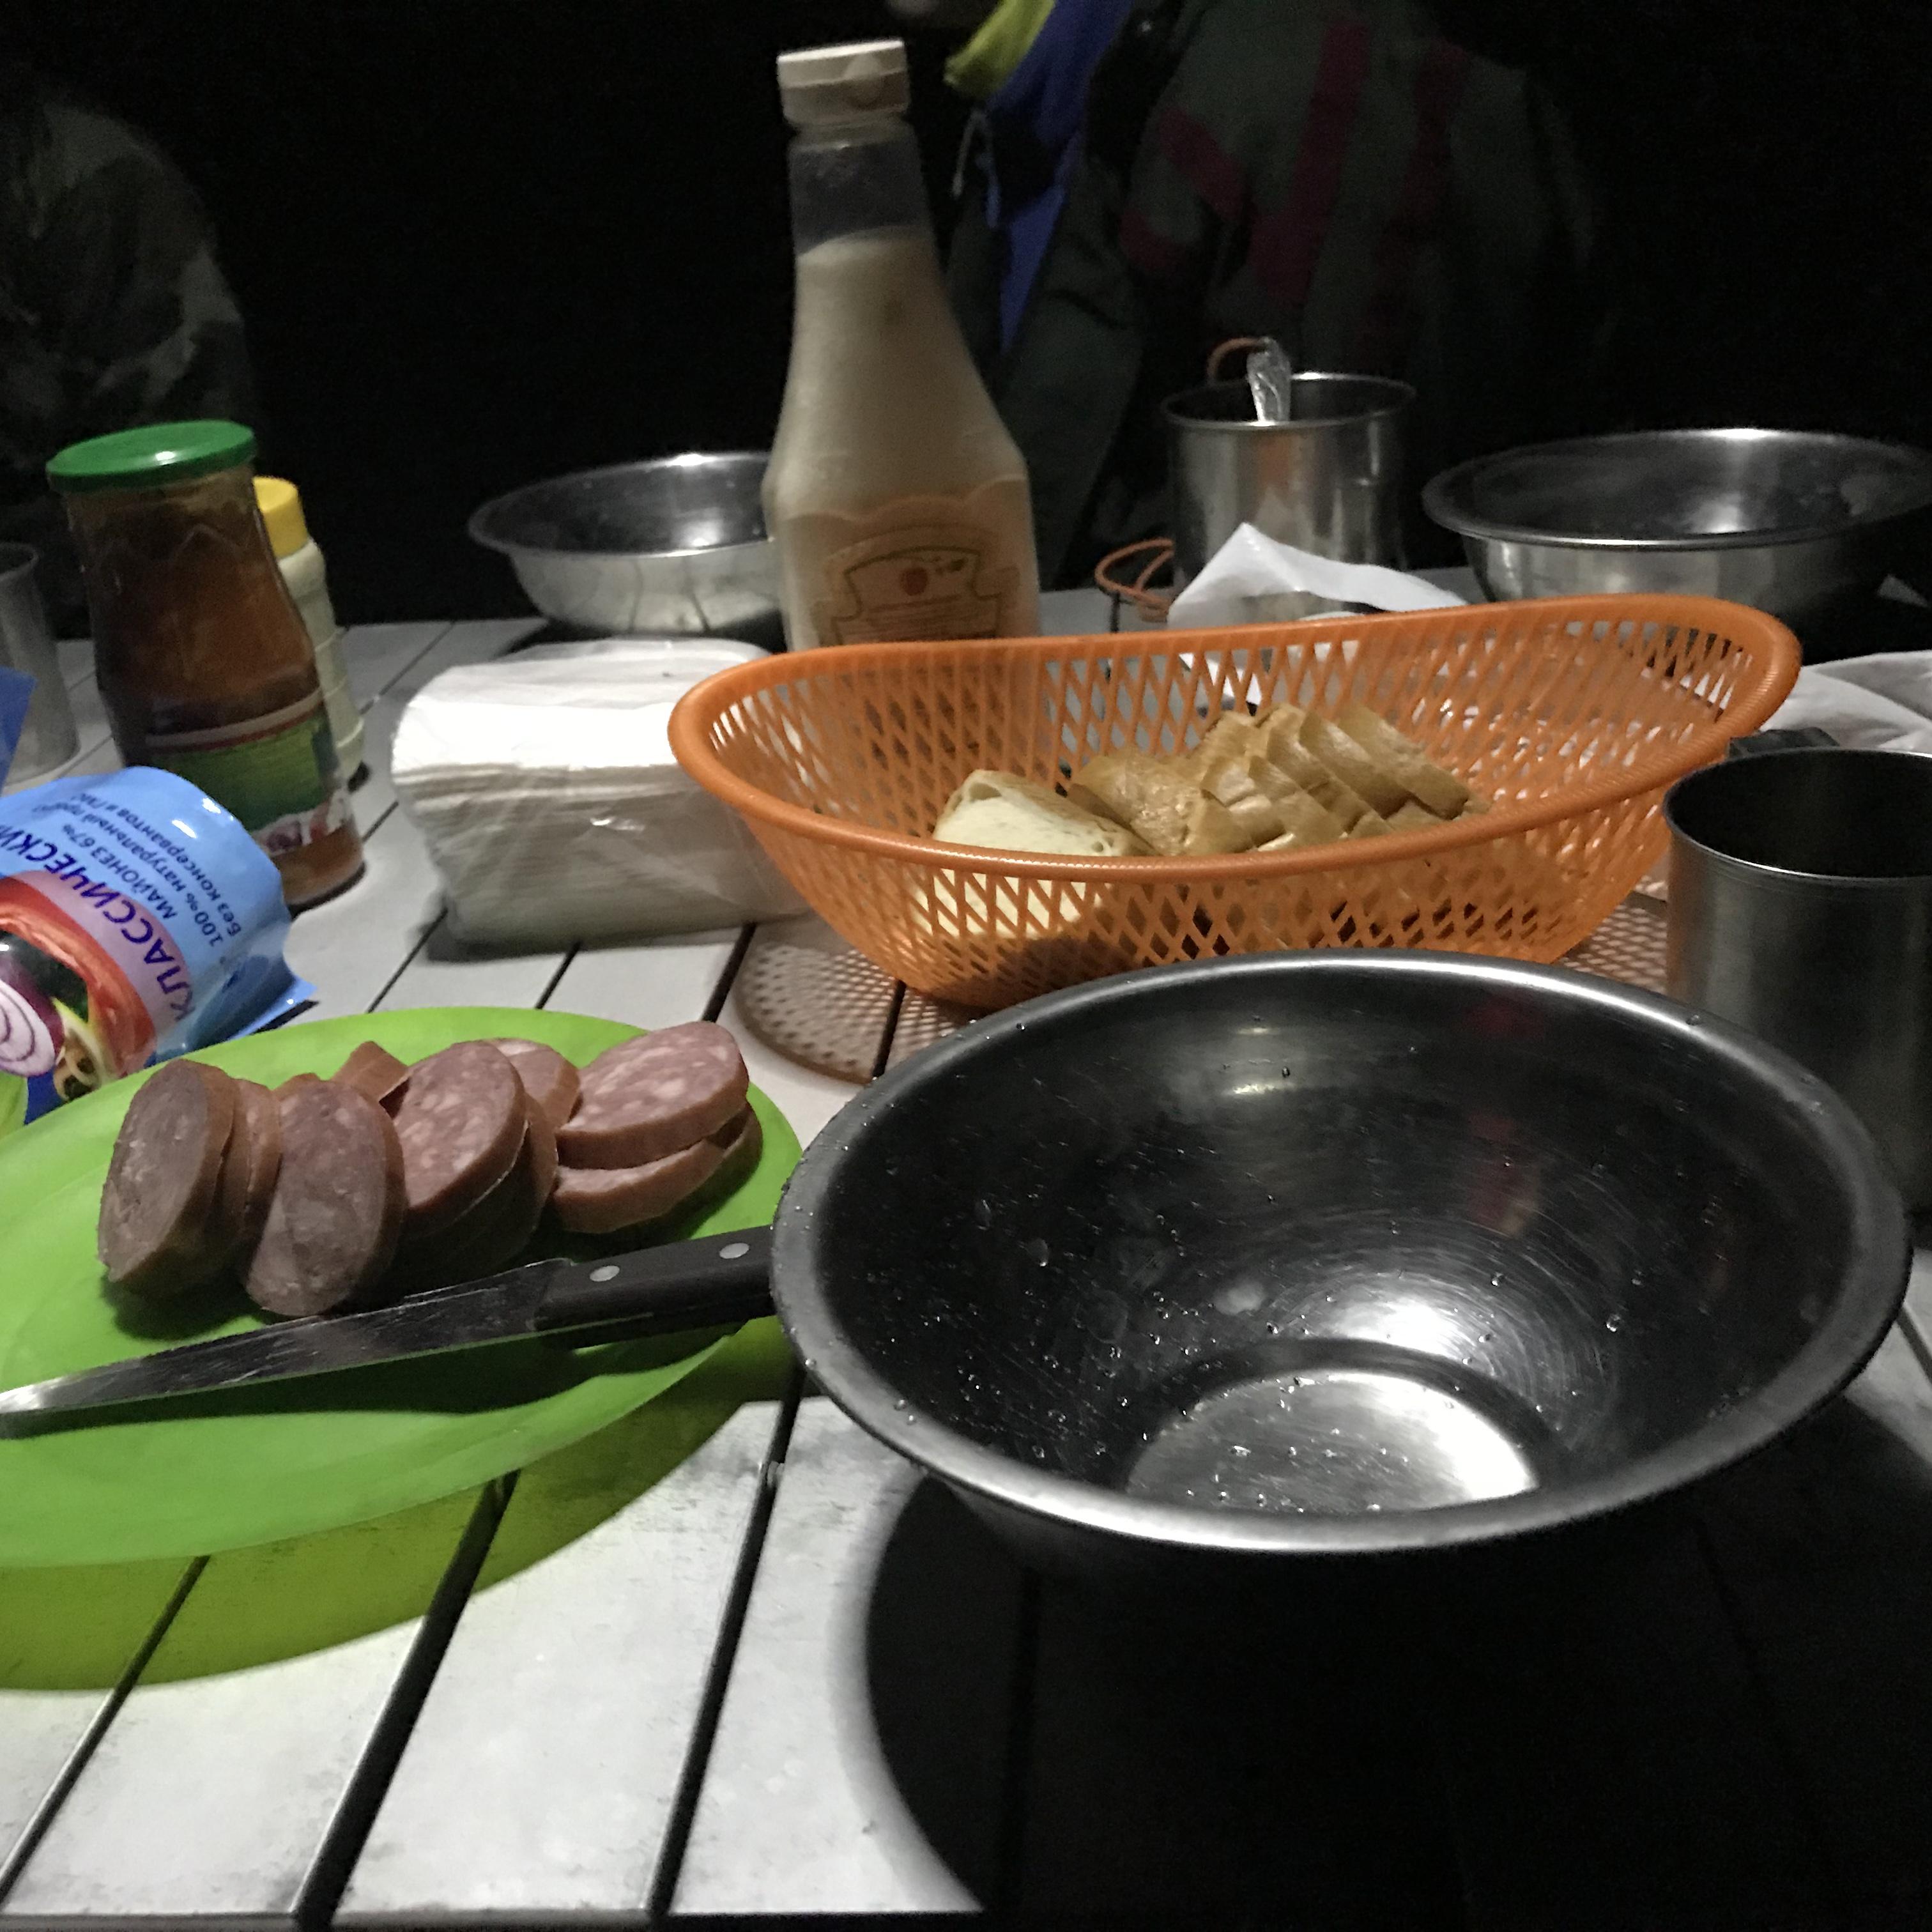 Ужин в лесу. 01/06/18